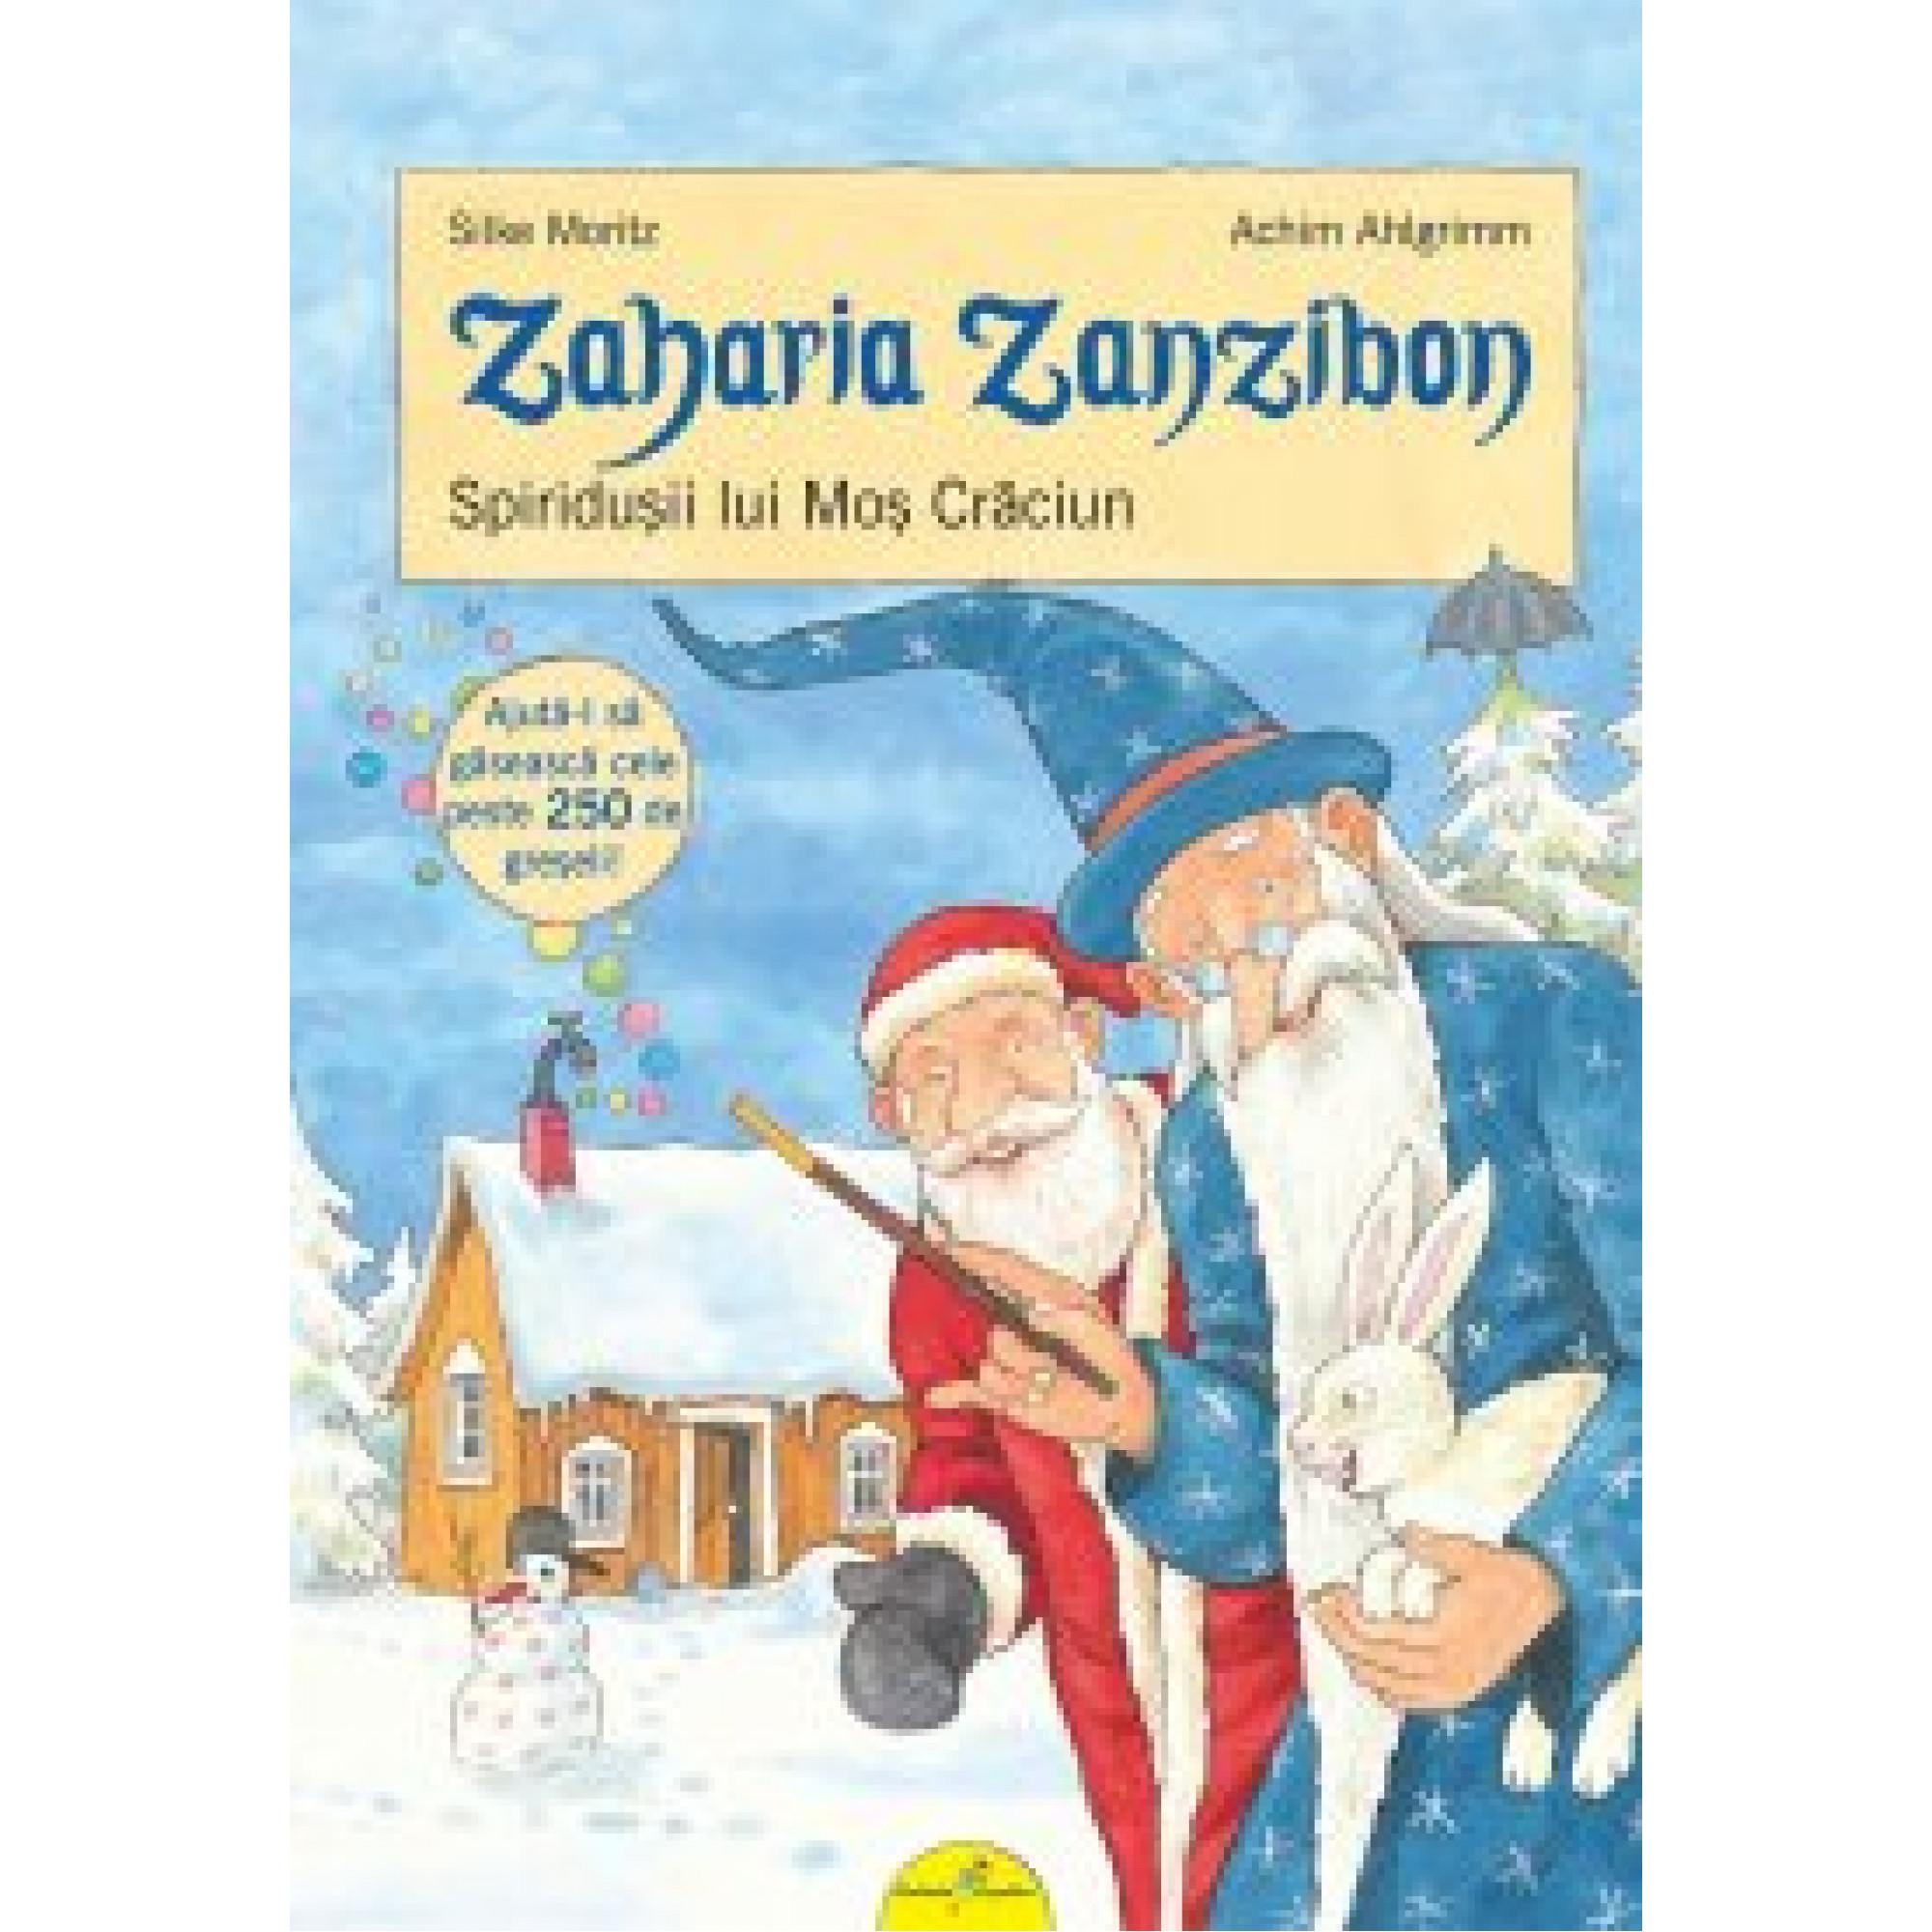 Zaharia Zanzibon. Spiridușii lui Moș Crăciun; Silke Moritz